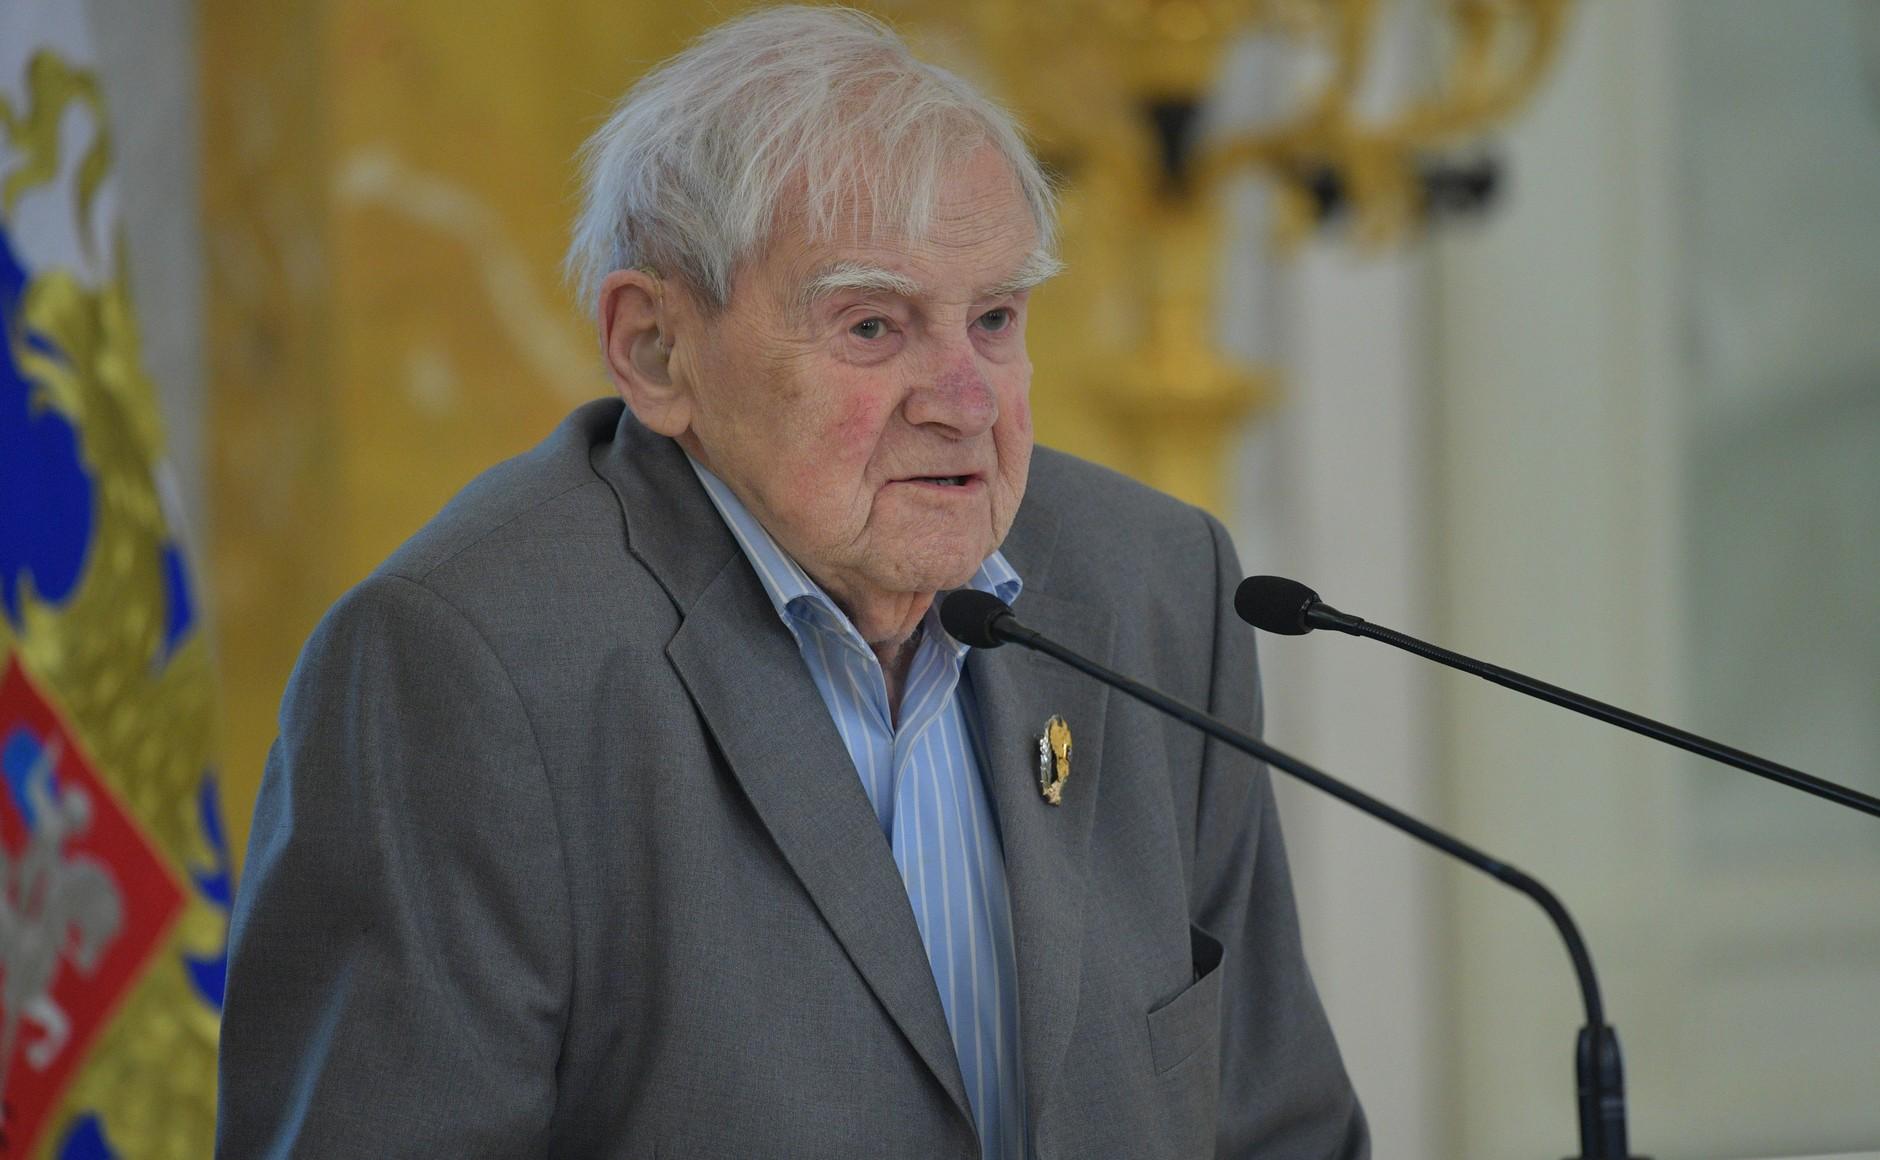 Laureate of the National Award Daniil Granin juin 2017 AU KREMLIN